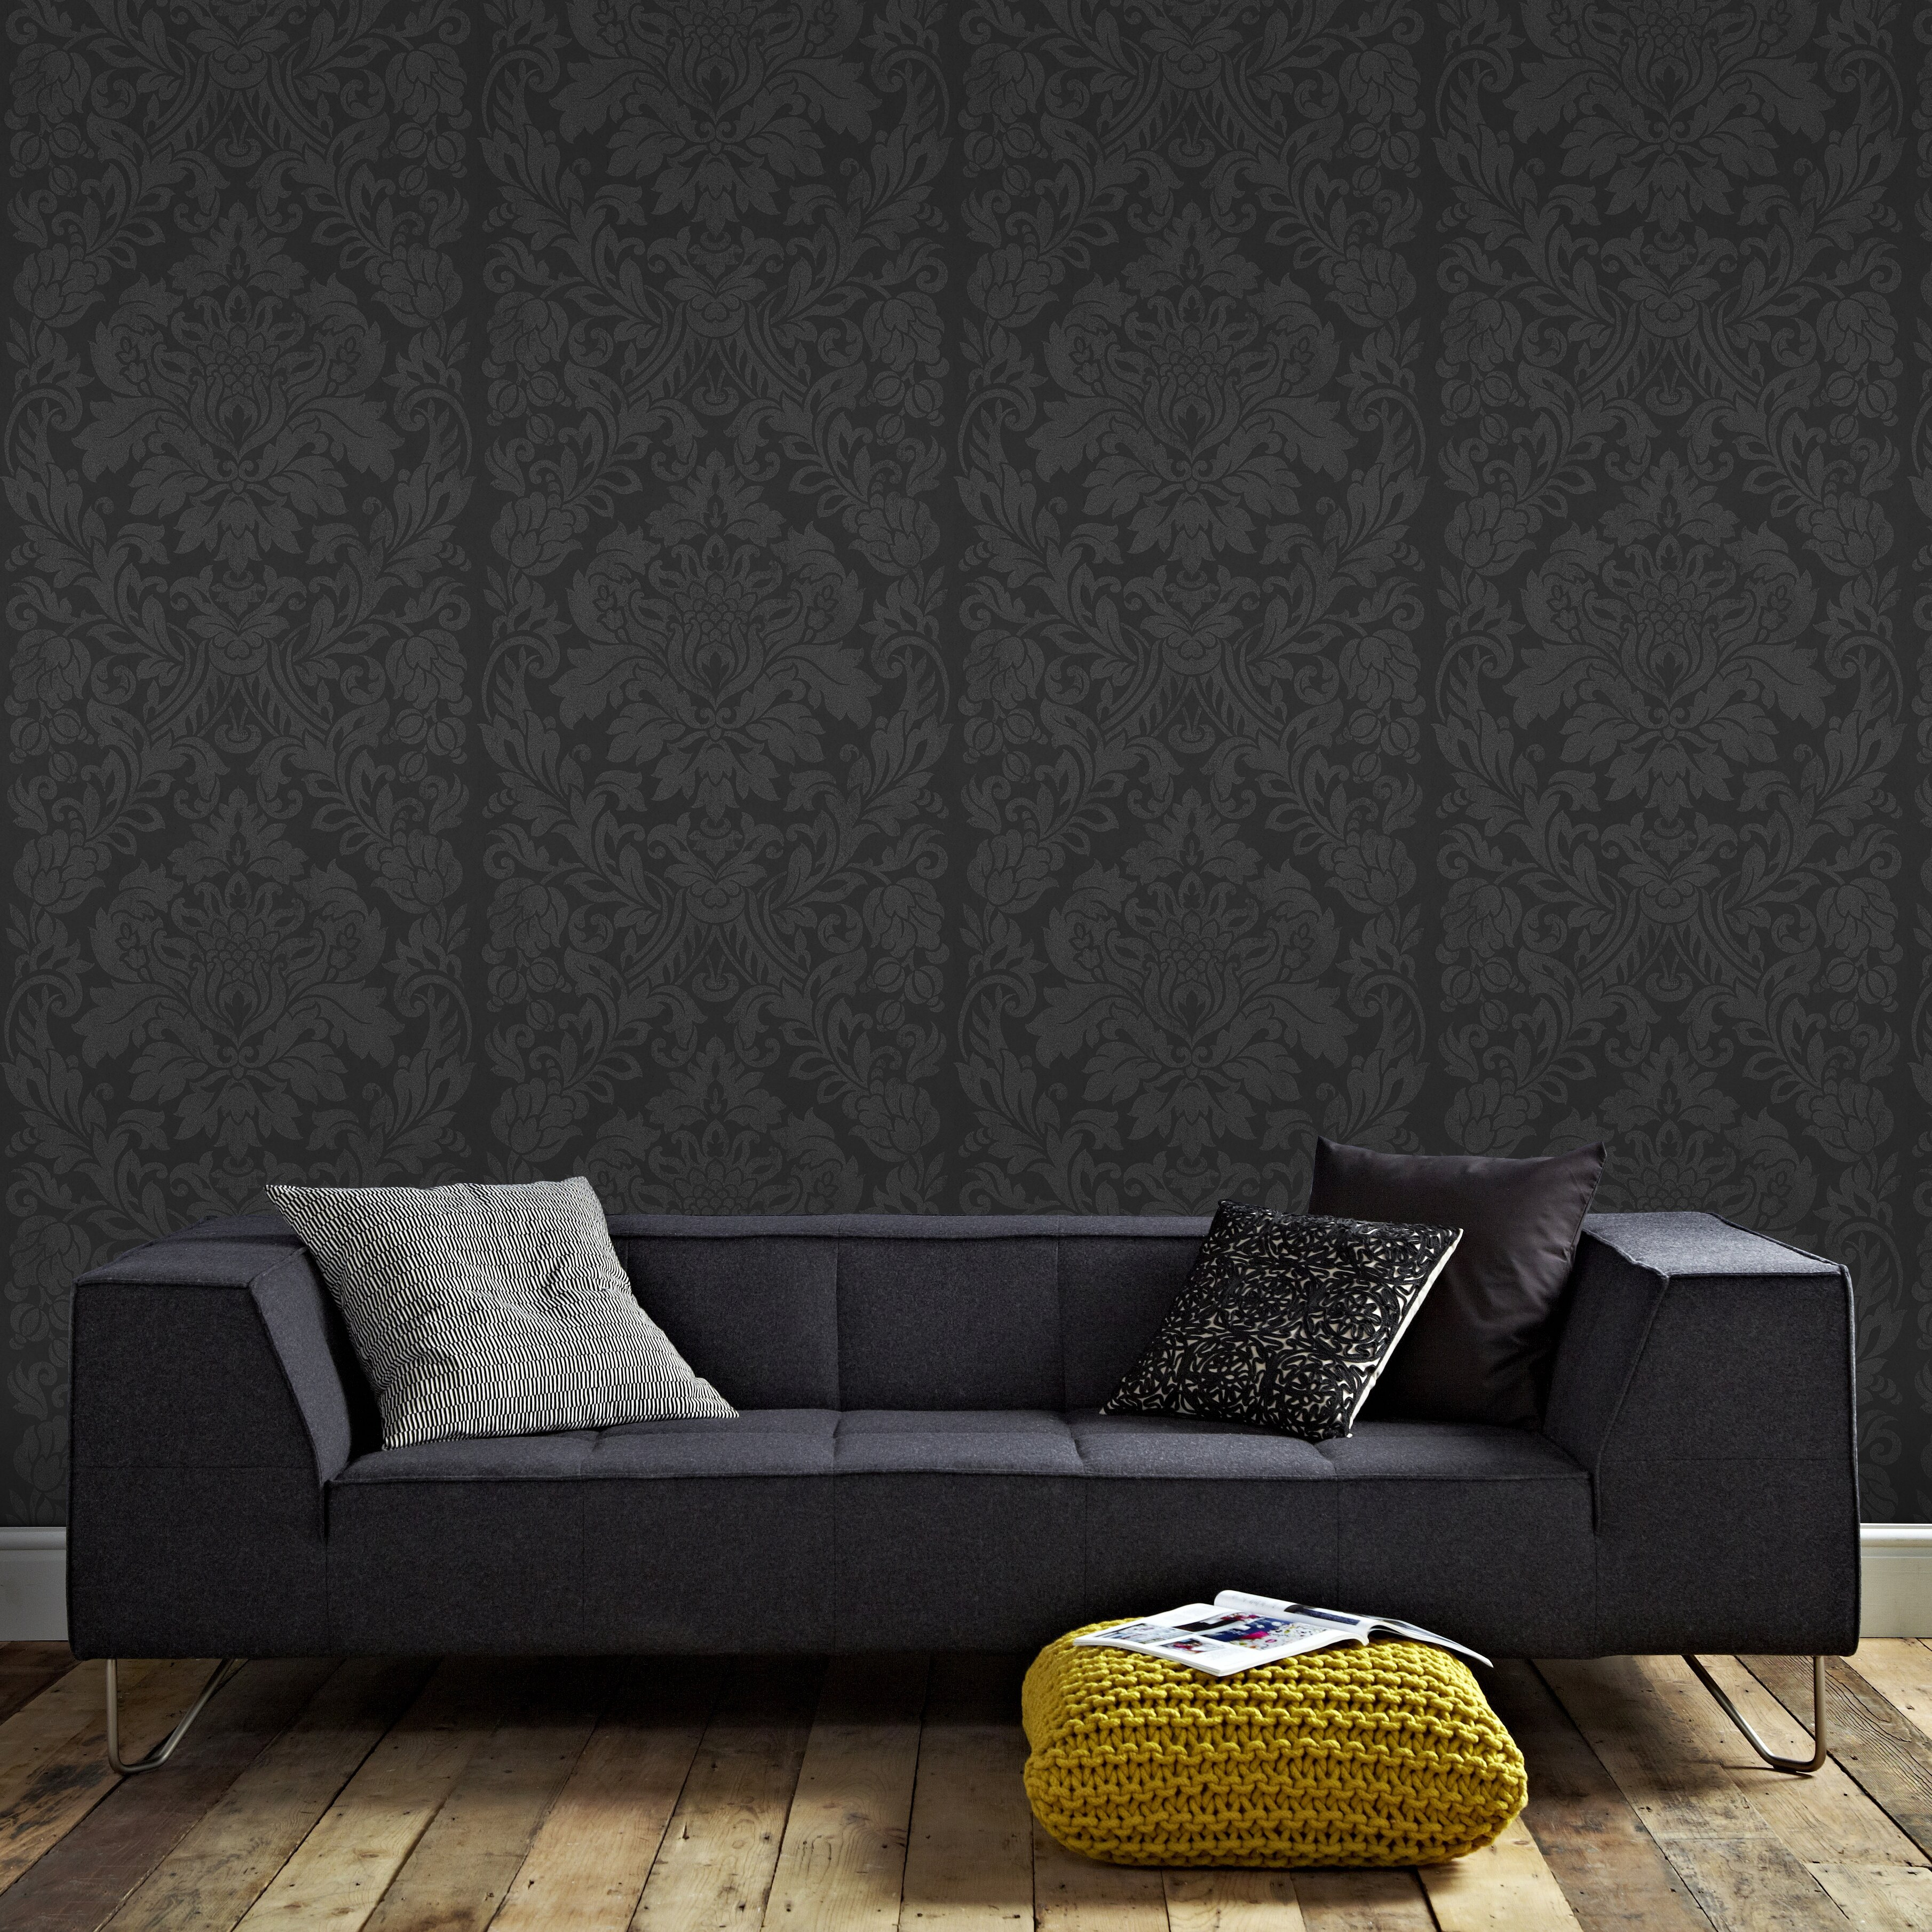 graham brown artisan gloriana 33 39 x 20 damask wallpaper reviews wayfair. Black Bedroom Furniture Sets. Home Design Ideas